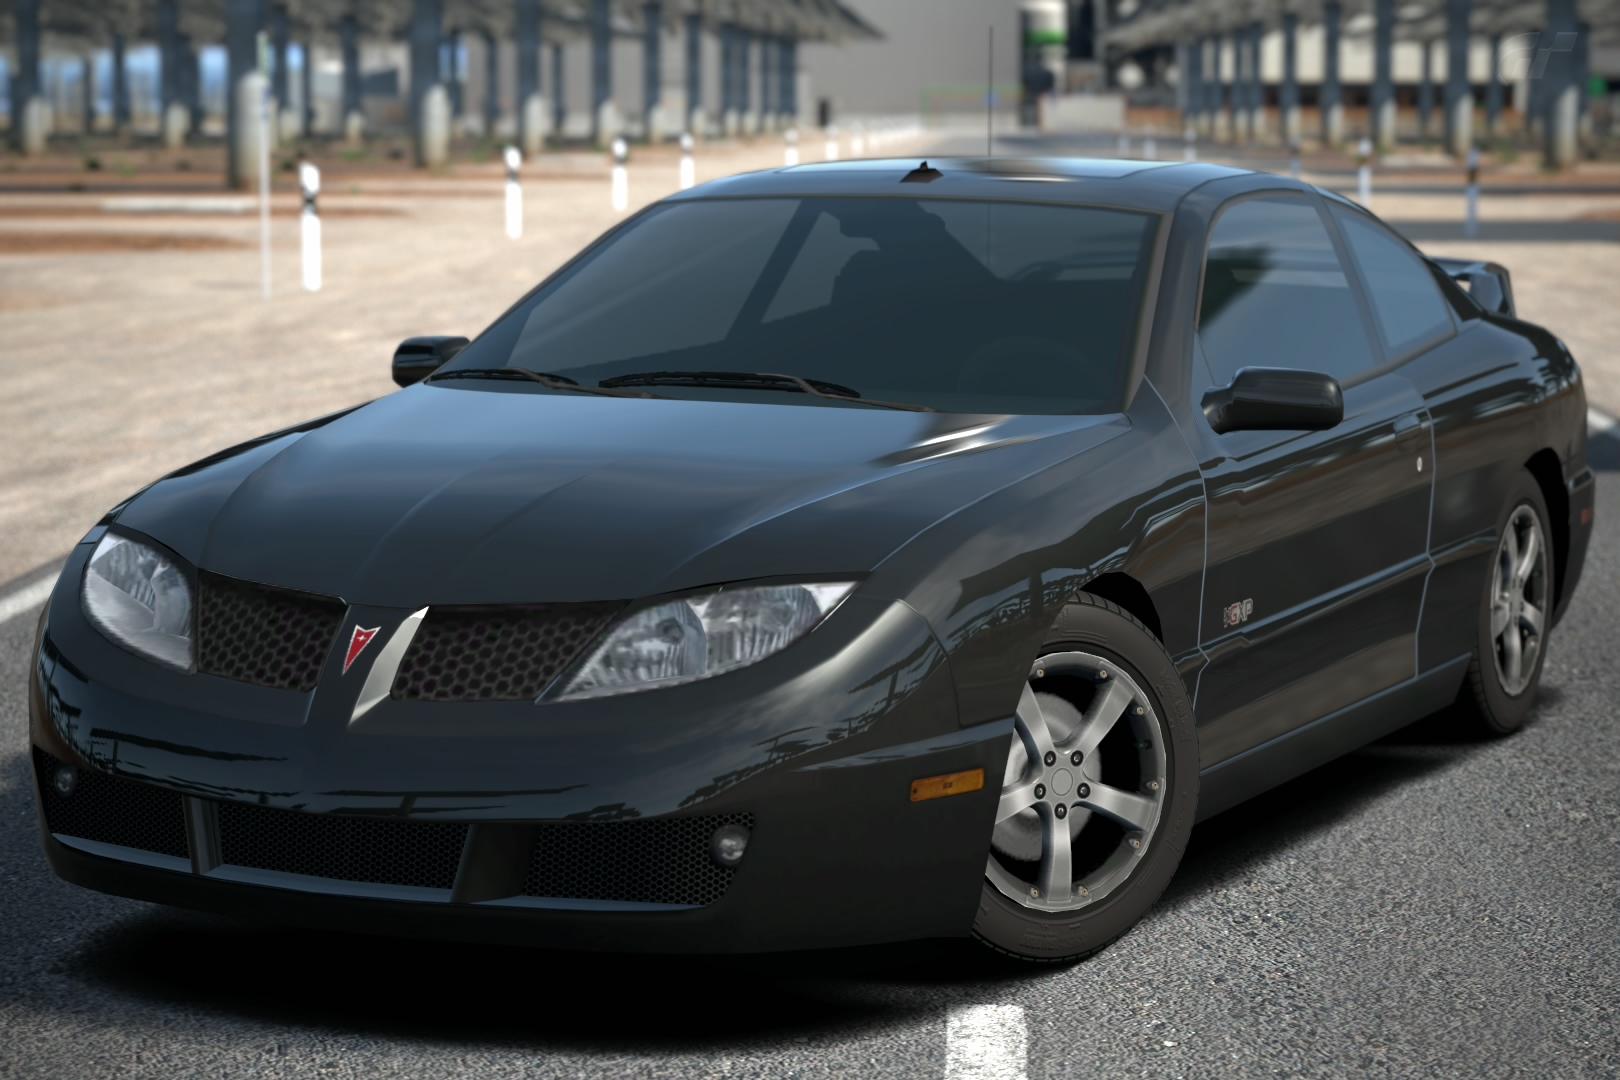 Pontiac Sunfire Gxp Concept 02 Gran Turismo Wiki Fandom